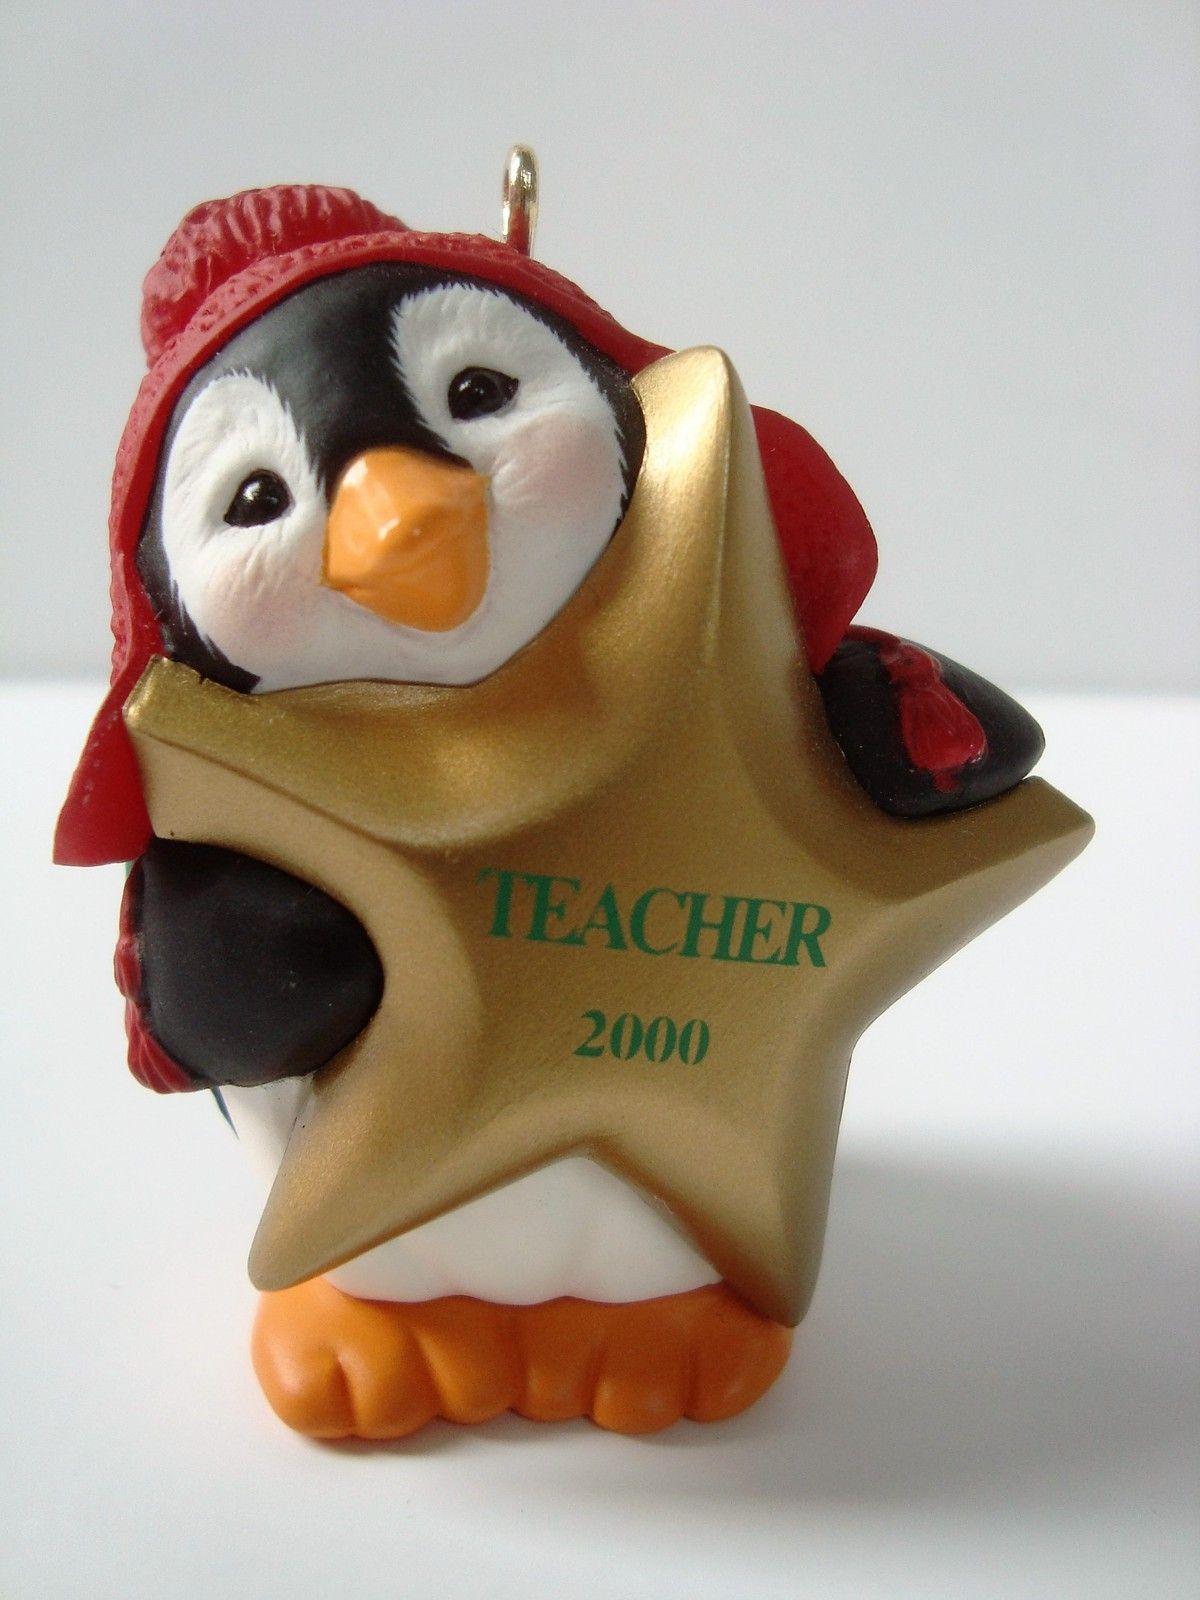 Hallmark Keepsake Ornament 2000 GoldStar Teacher with box